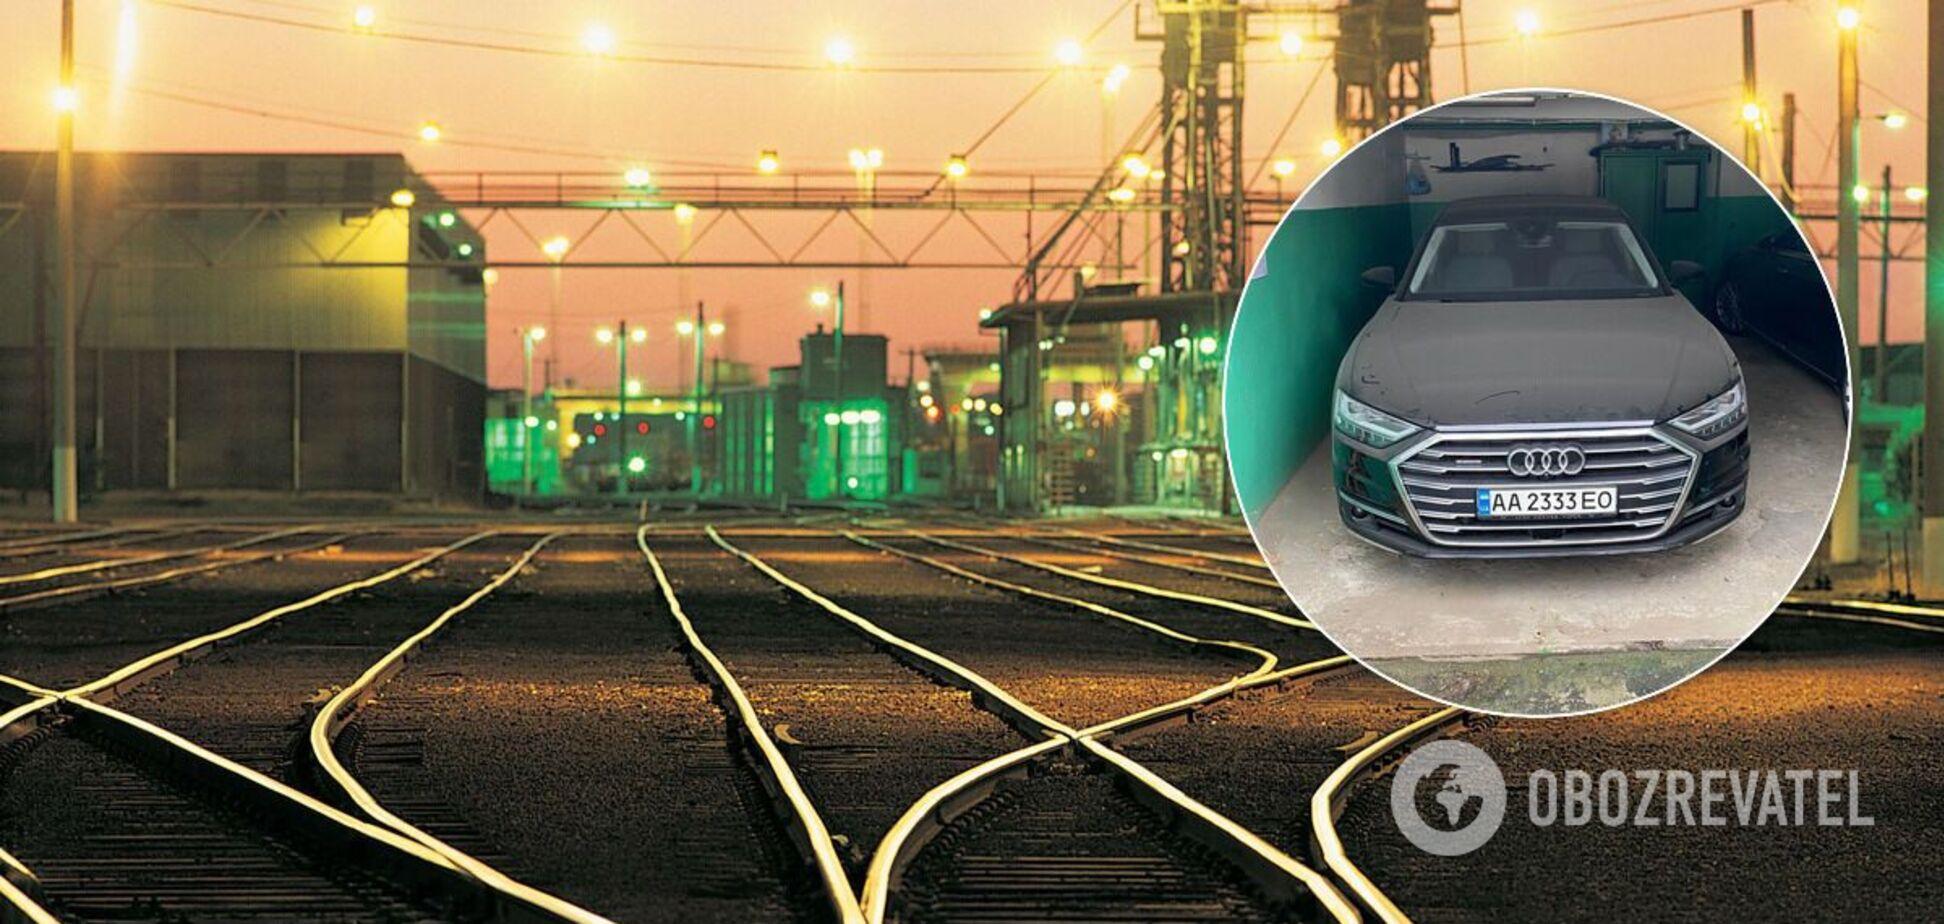 Укрзалізниця купила два лімузини за 4,5 млн грн кожен